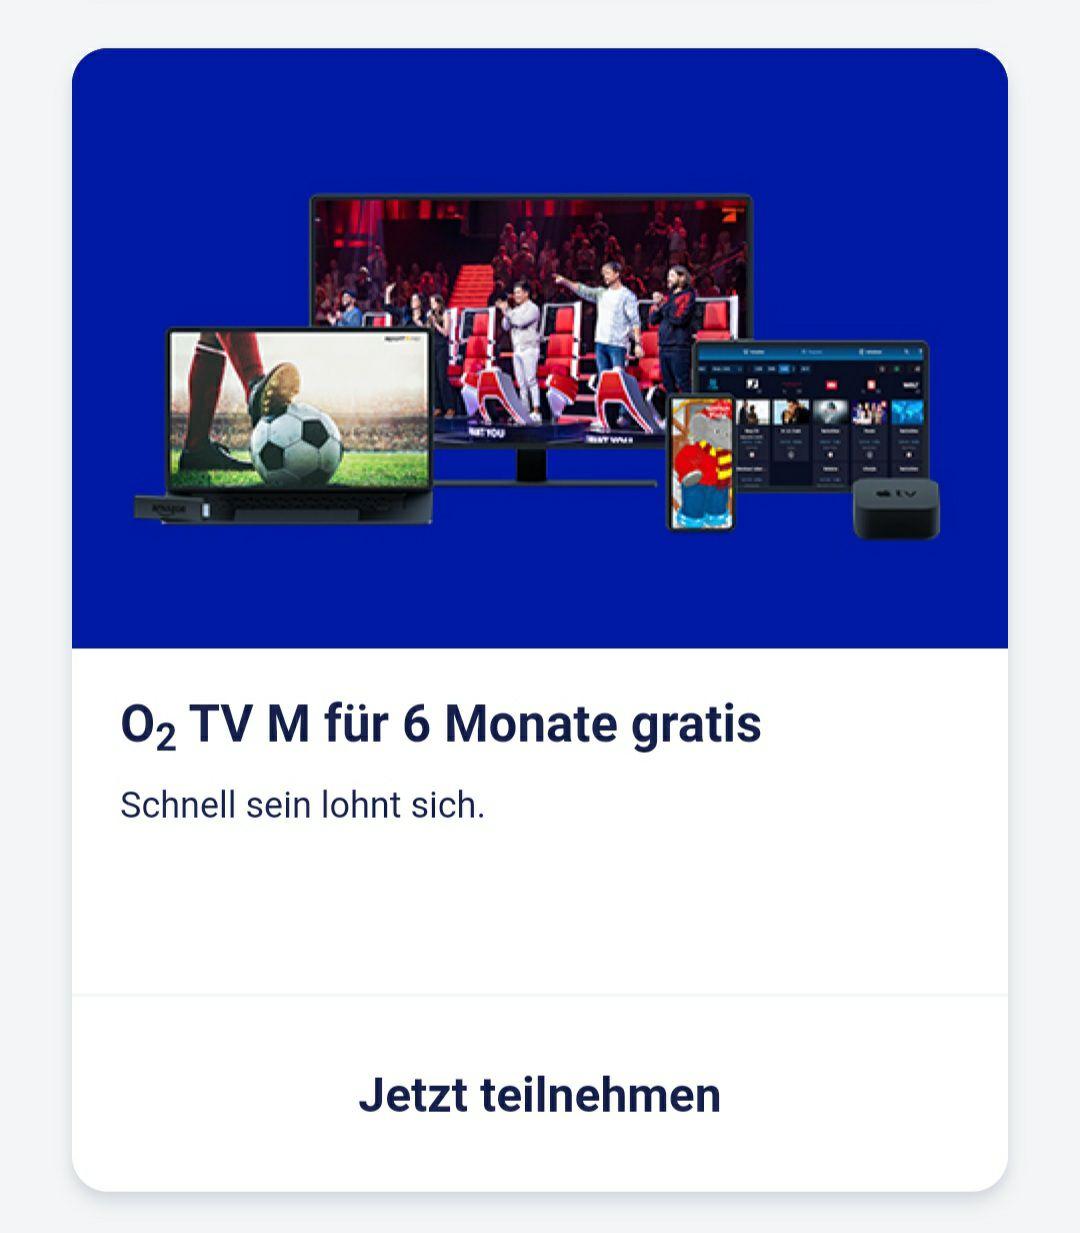 o2 TV M für 6 Monate kostenlos [o2 Priority]